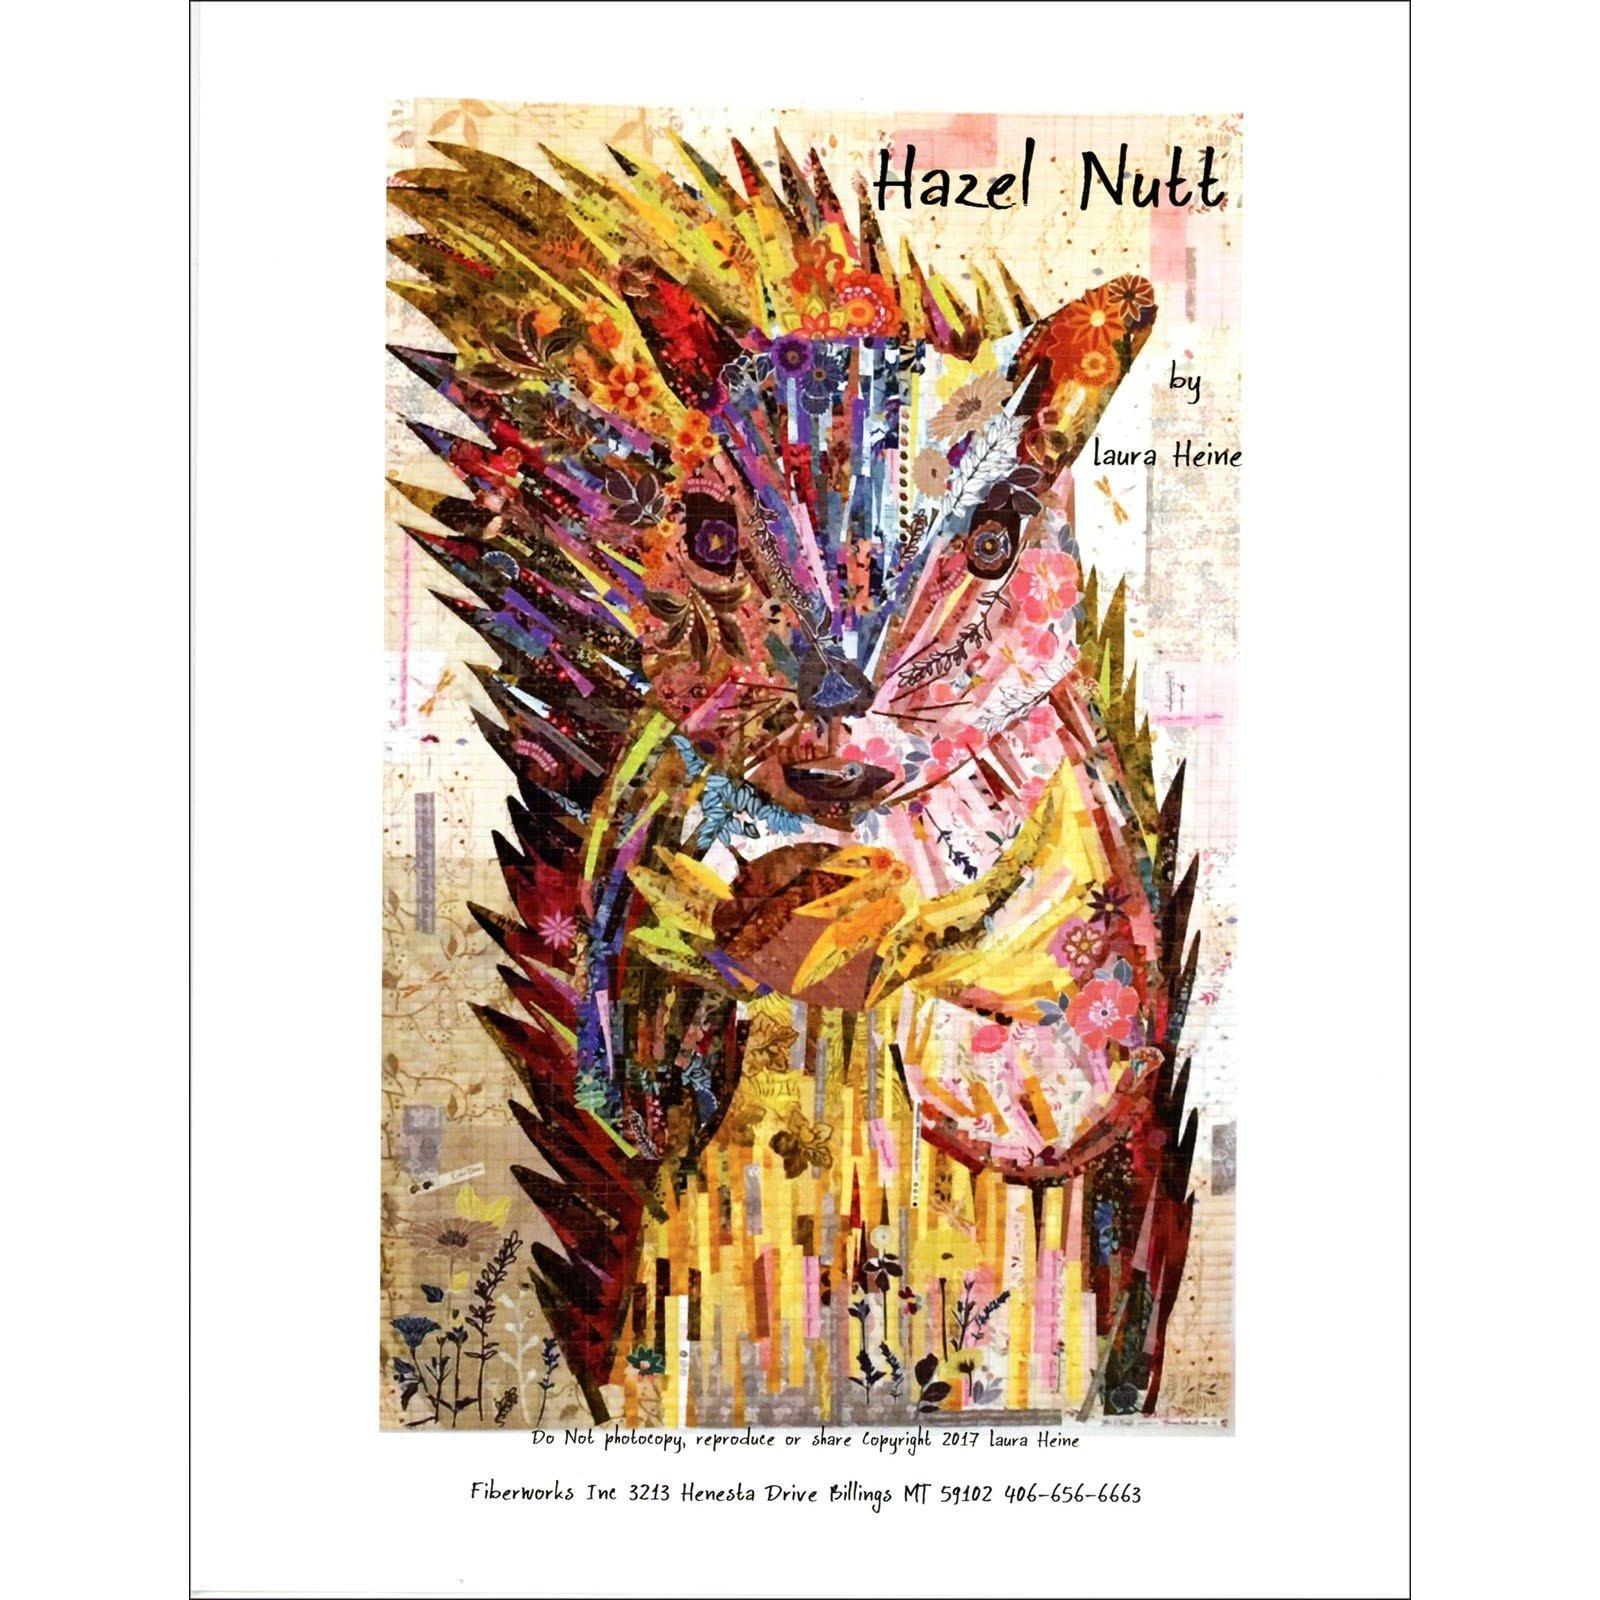 Hazel Nutt by Laura Heine - 40 x 58